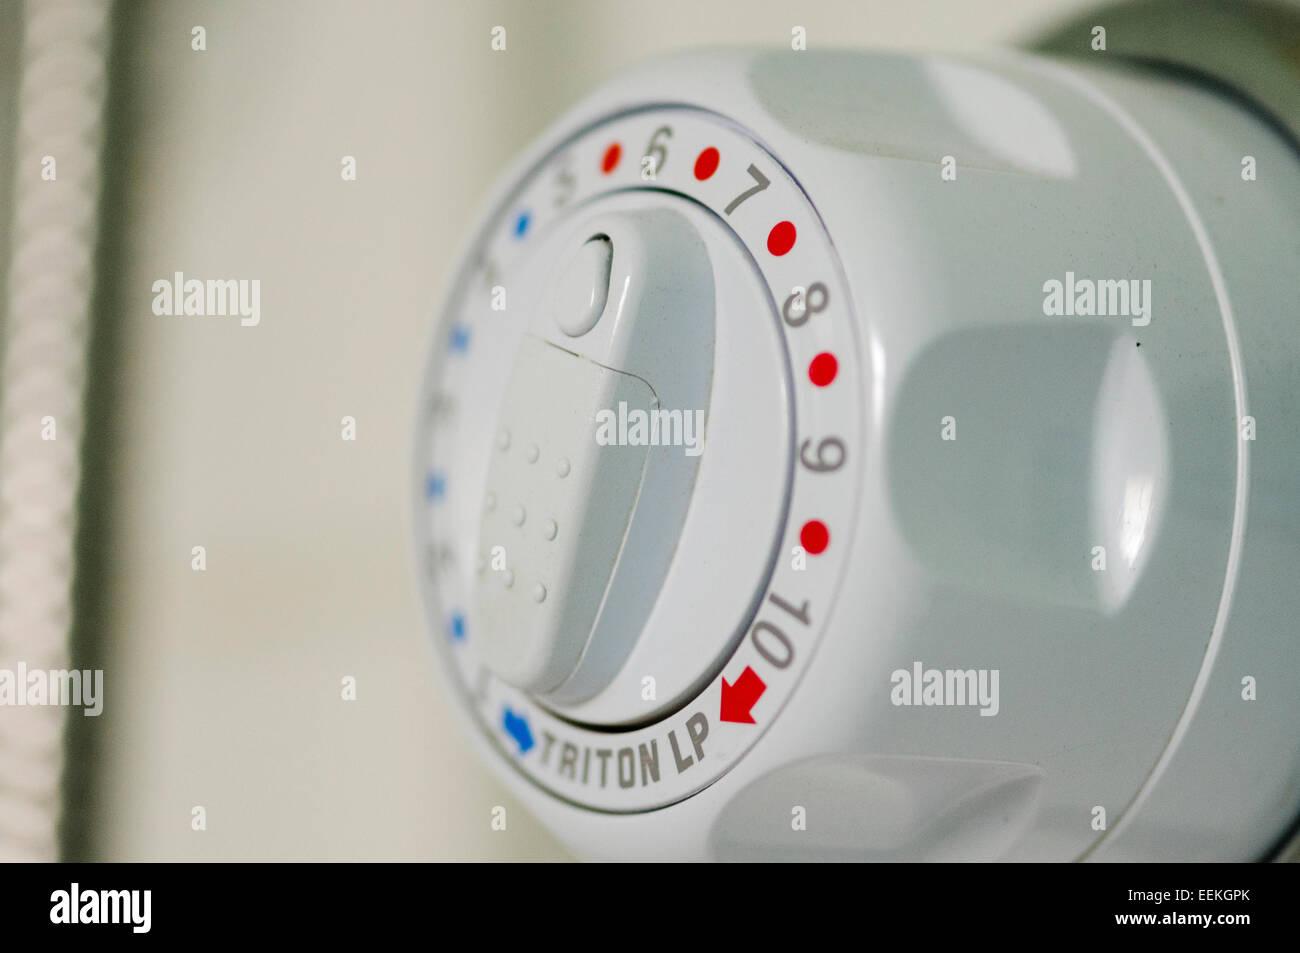 Temperature control of a shower mixer valve - Stock Image